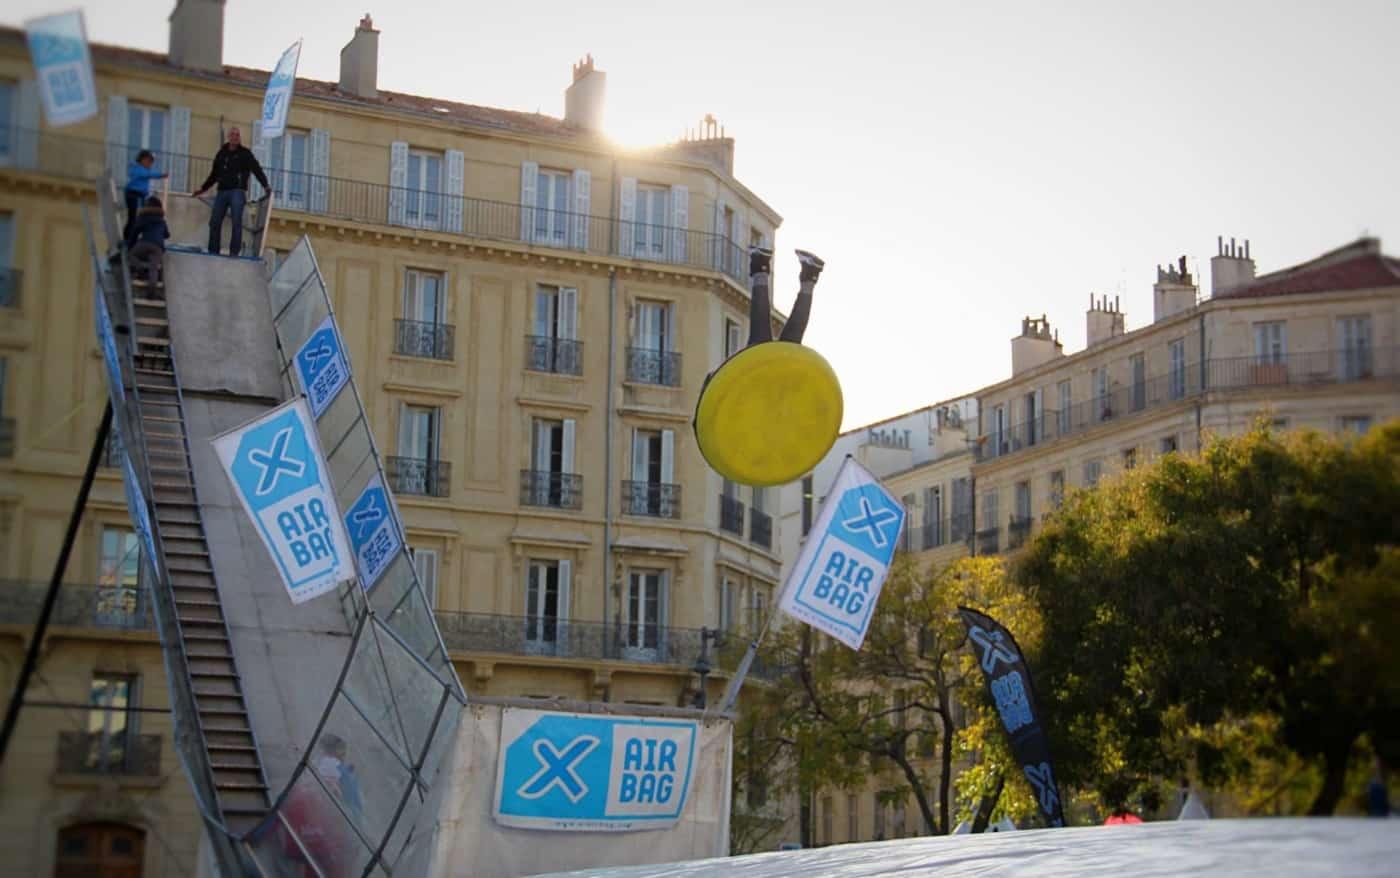 , Skatepark, piste de luge : le théâtre Silvain se transforme en Gliss'Park, Made in Marseille, Made in Marseille